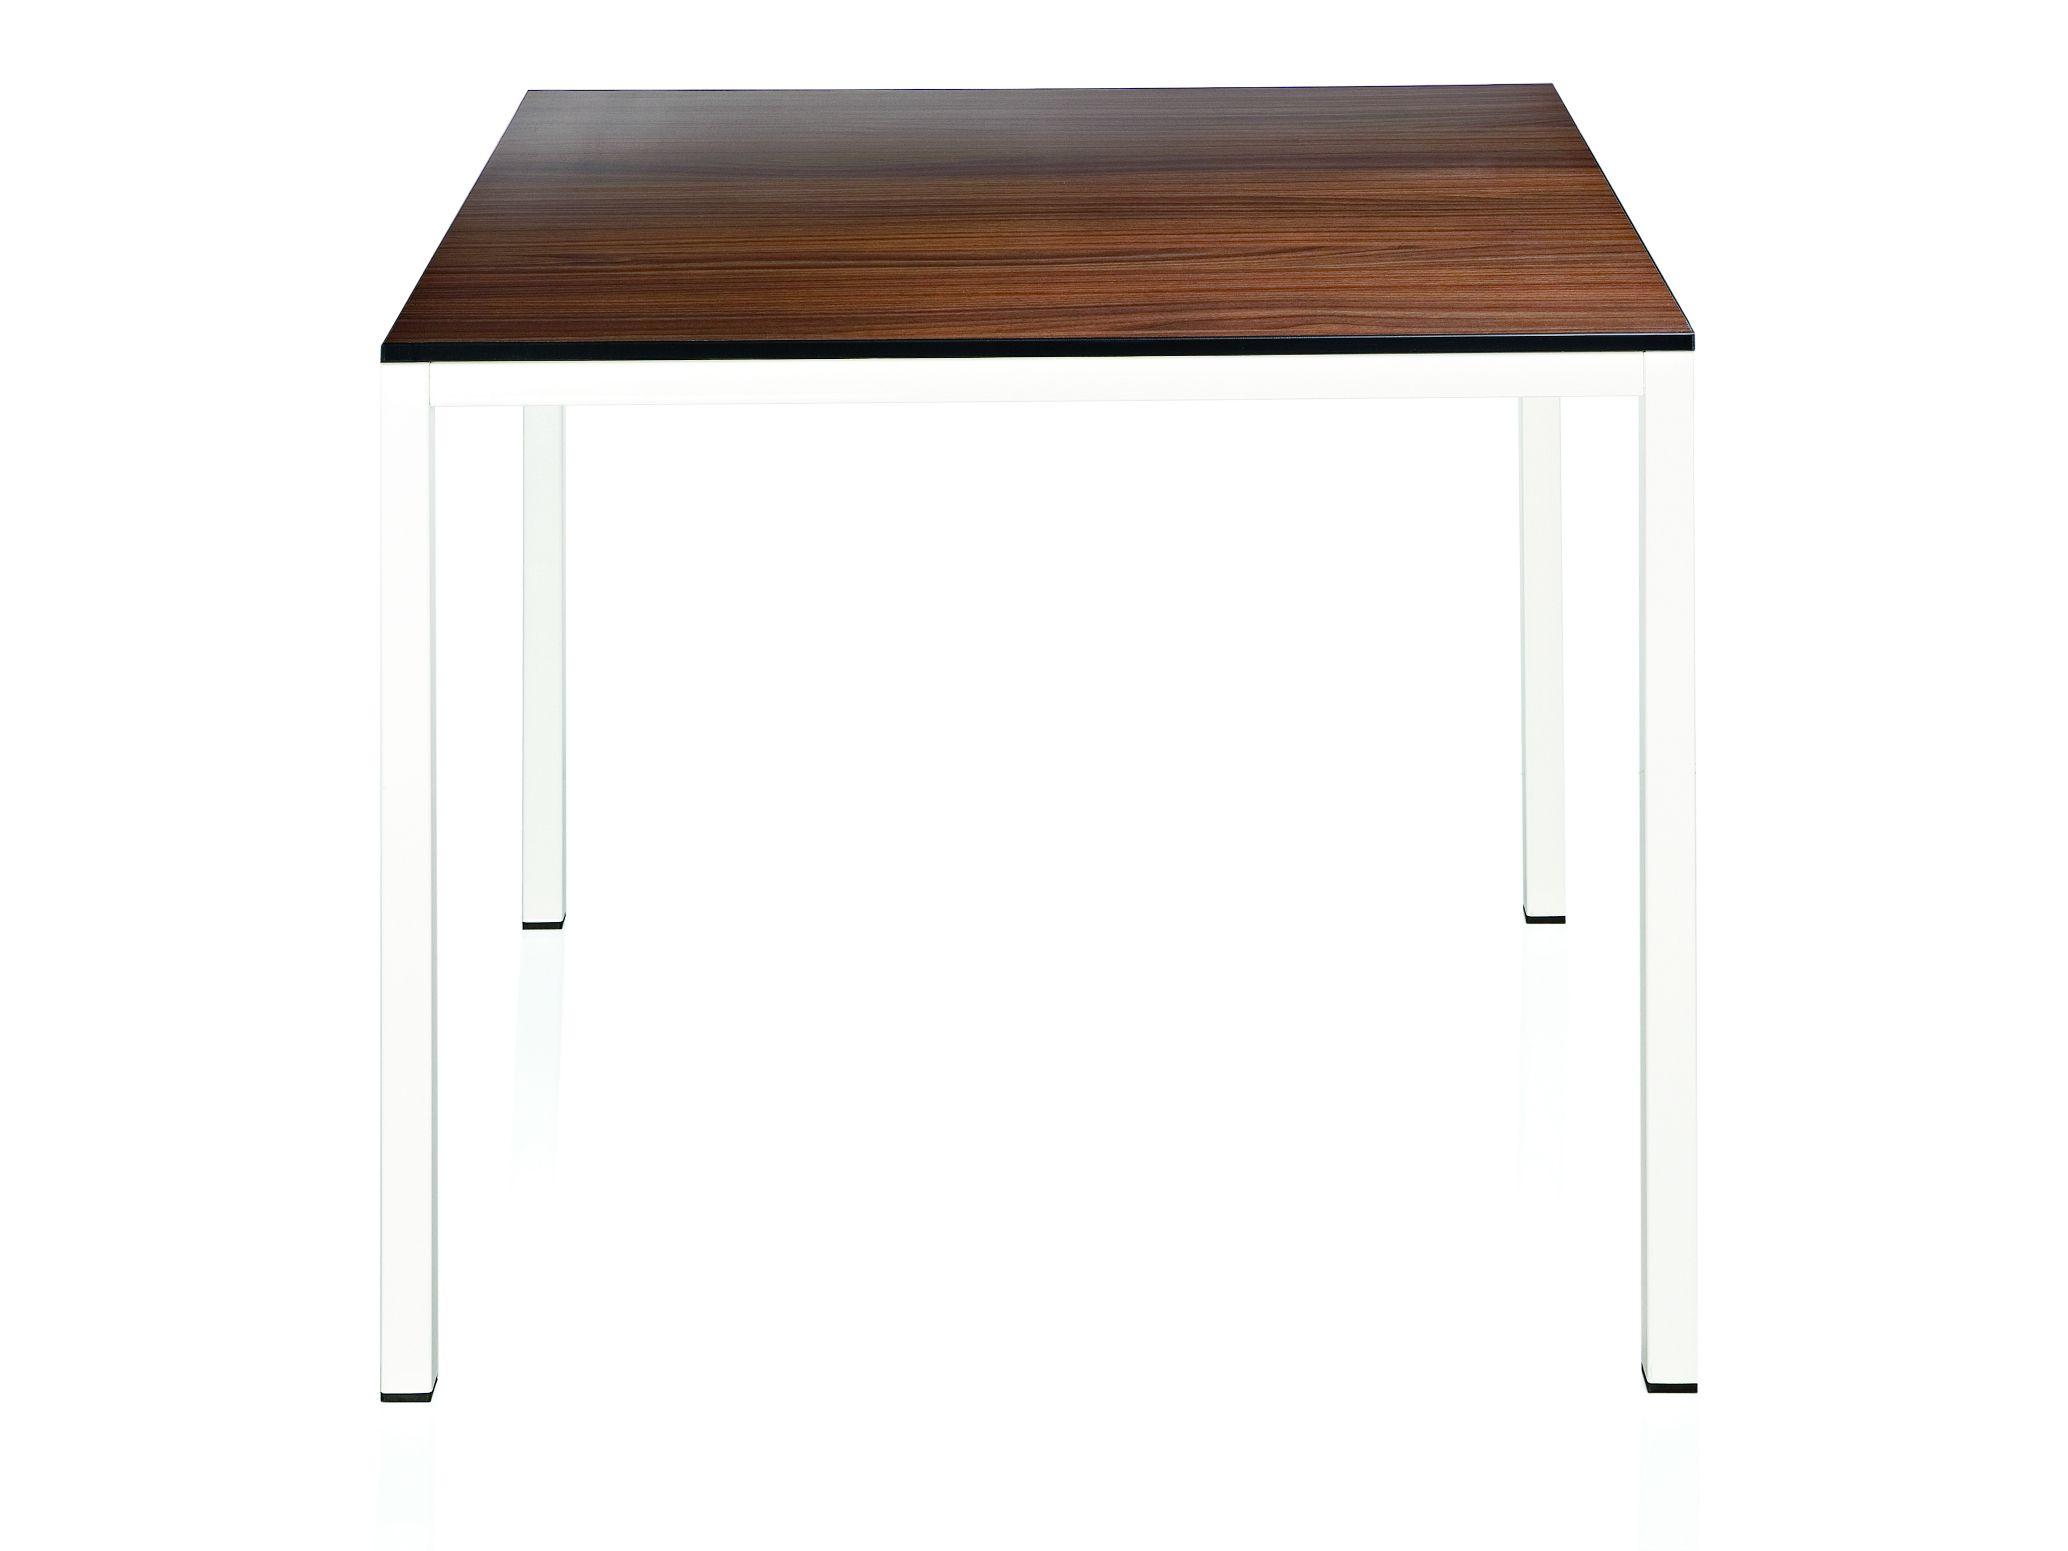 quadratischer tisch aus laminat kollektion charlie by alma design design tria de design. Black Bedroom Furniture Sets. Home Design Ideas